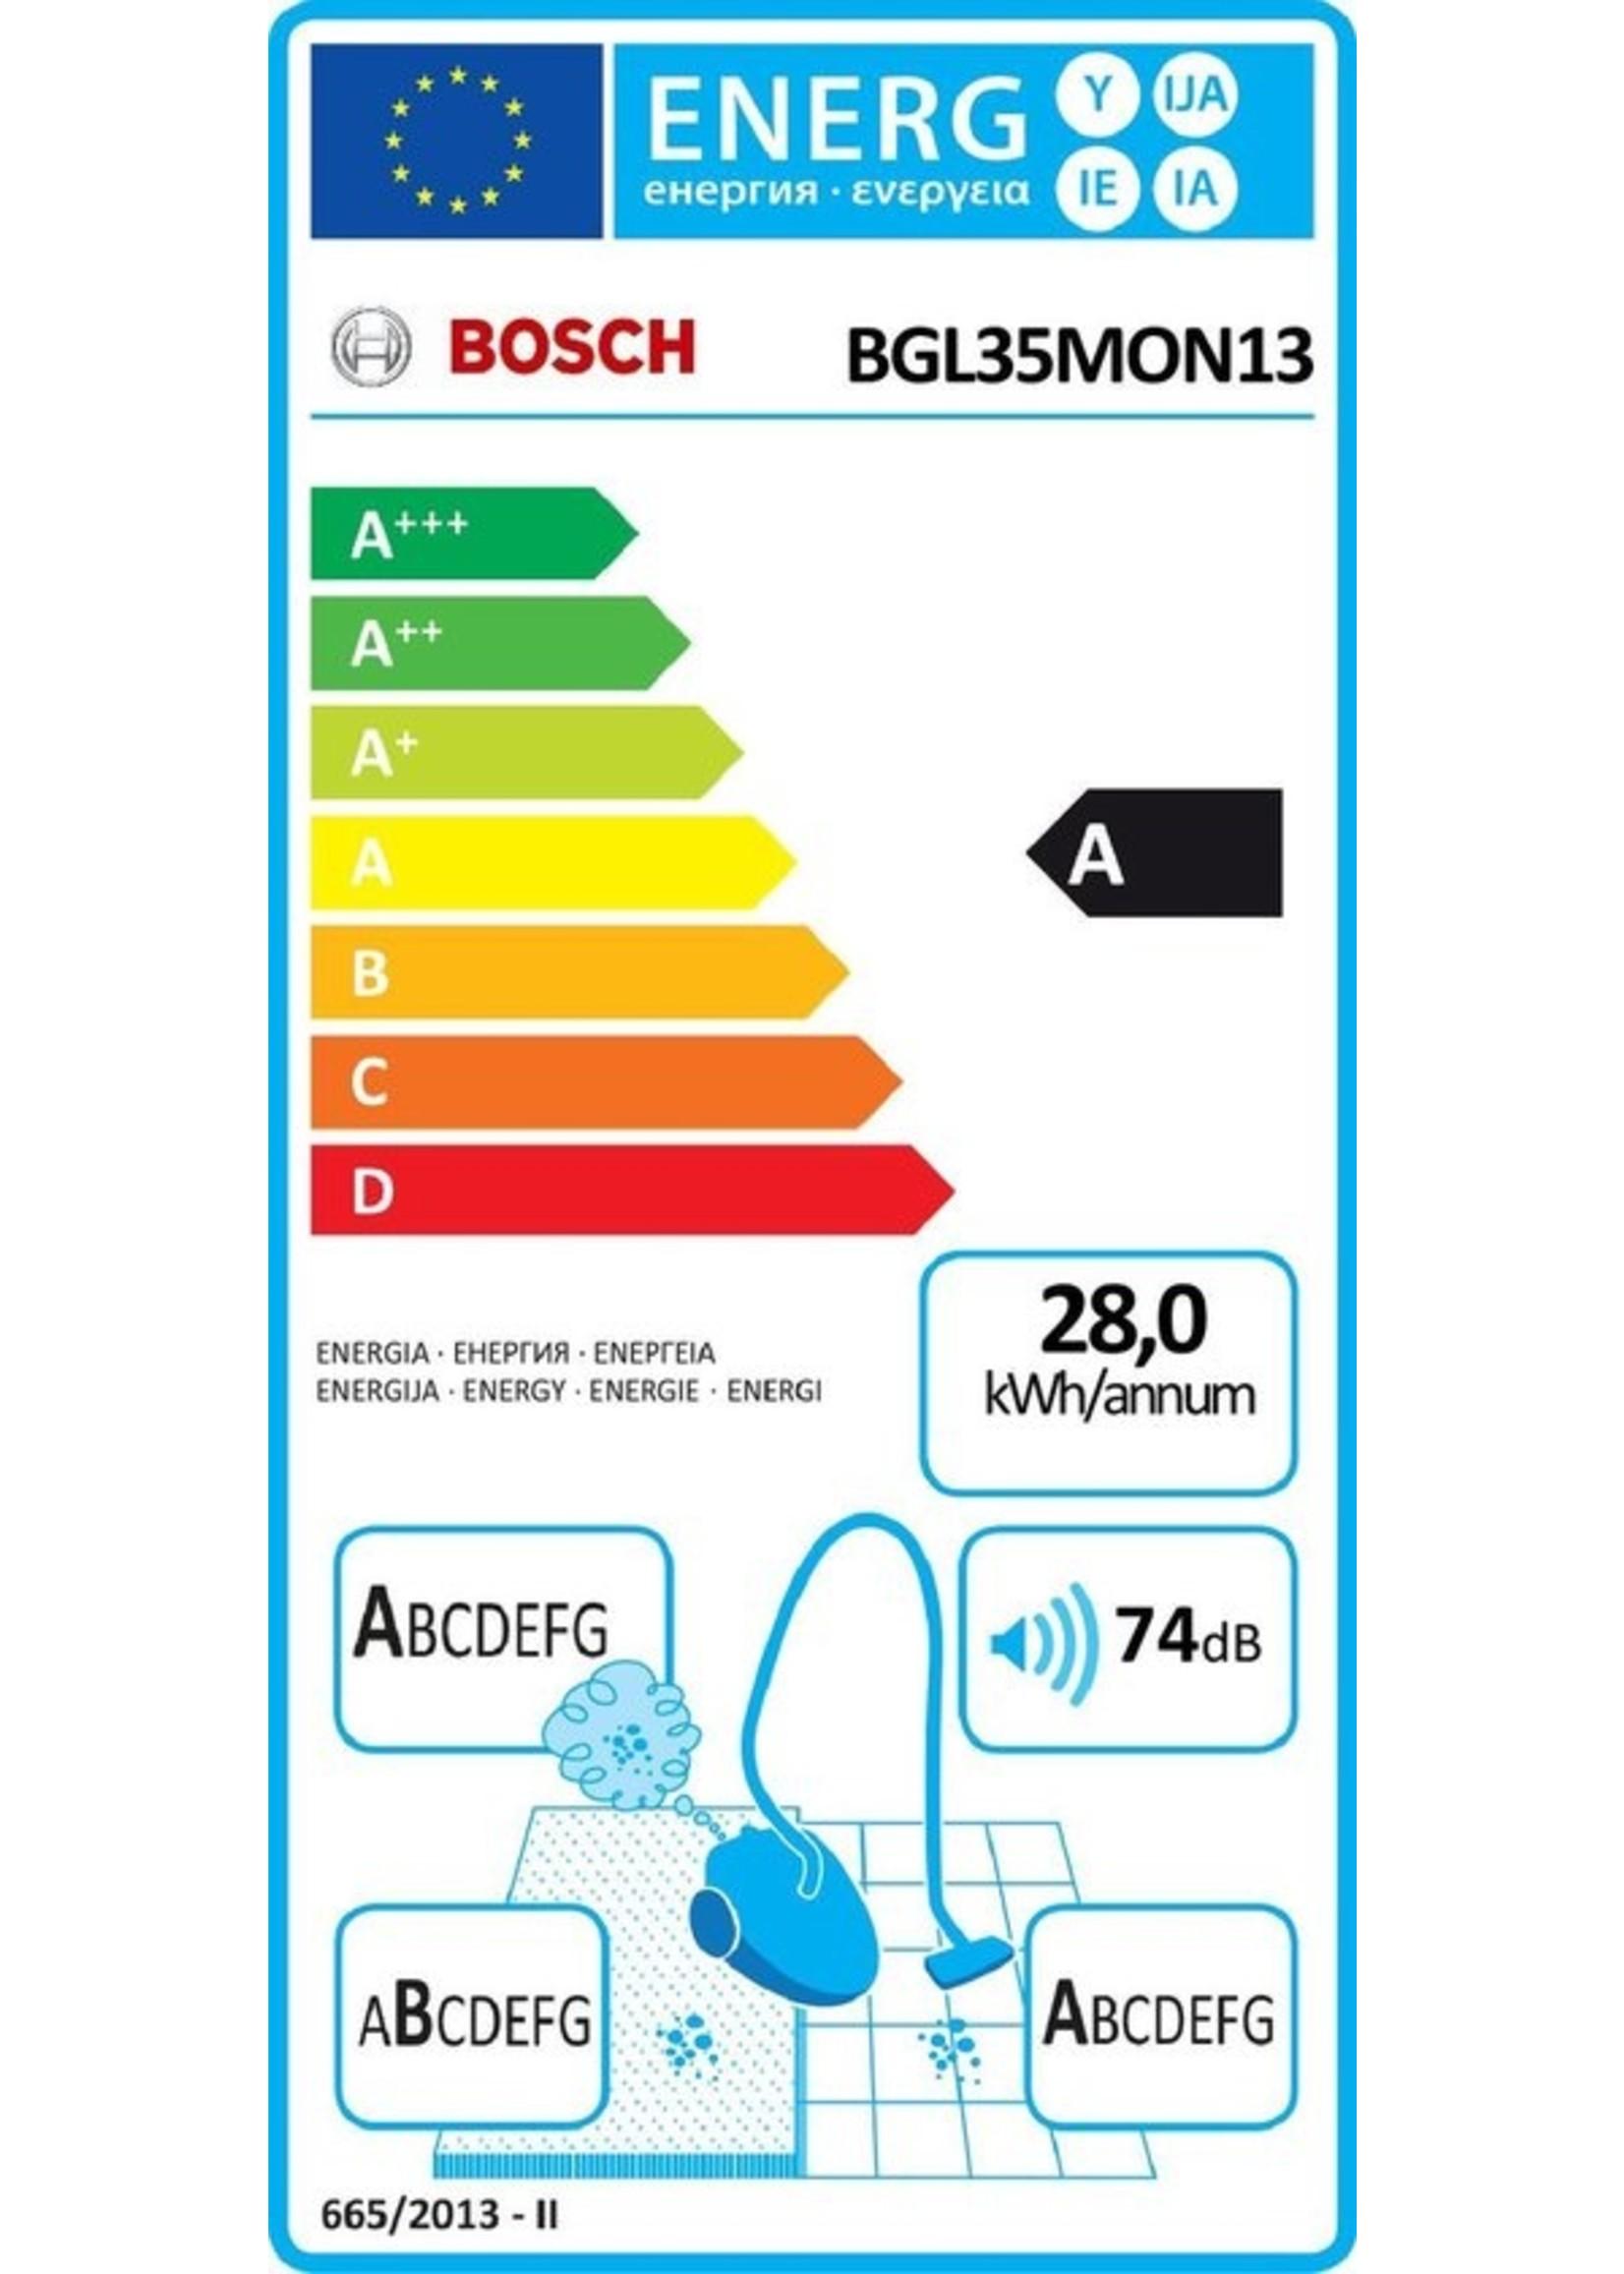 Bosch Bosch Haushalt Bgl35Mon13 - Stofzuiger met zak